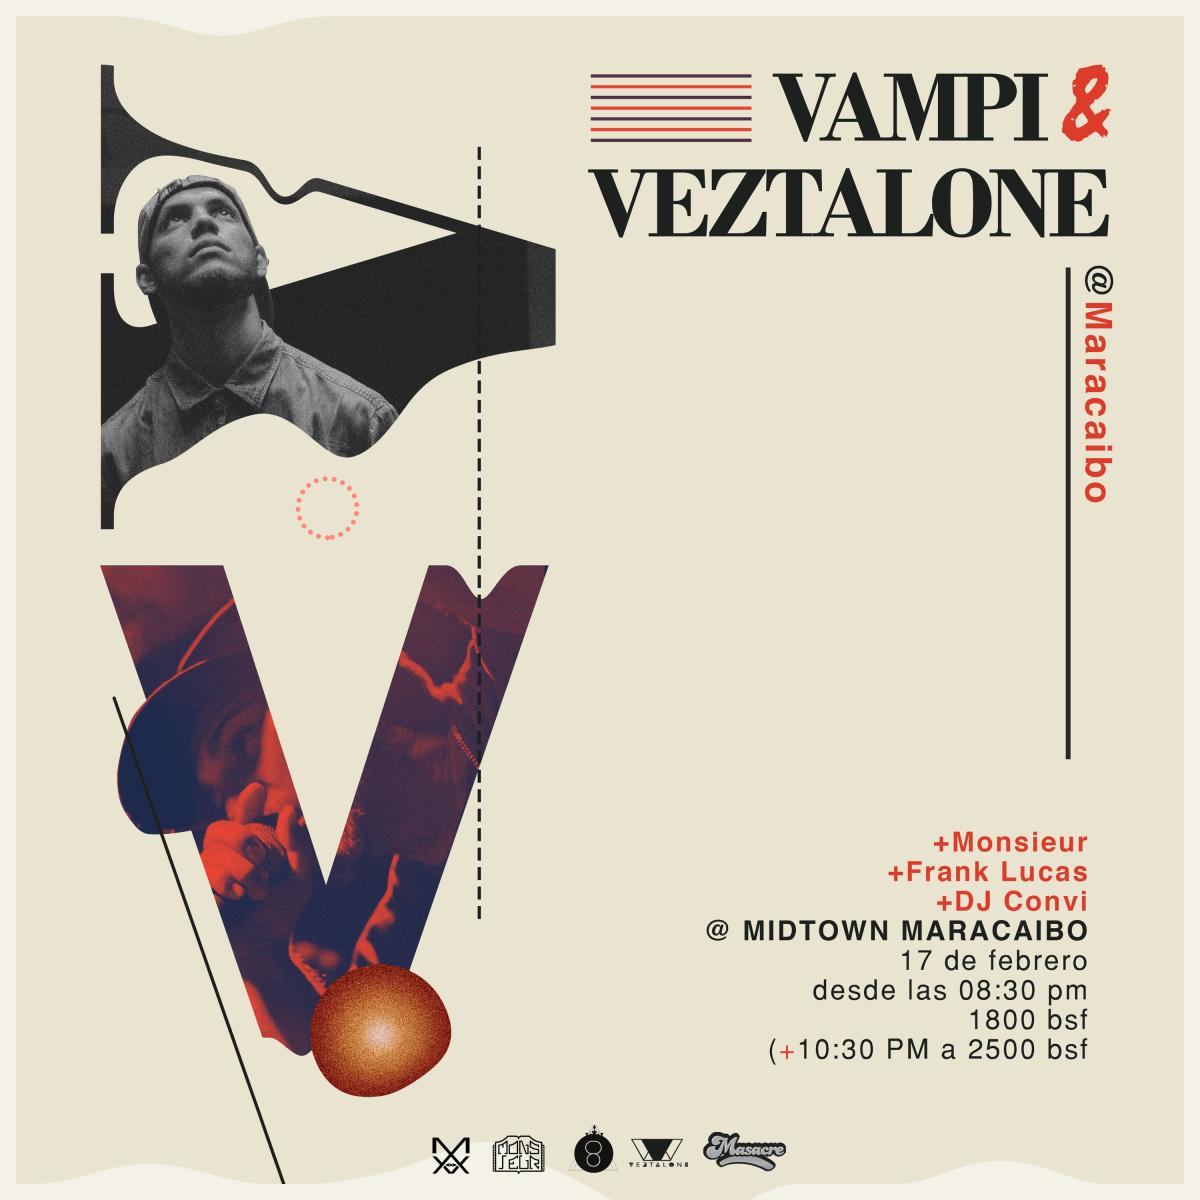 Veztalone-Vampi- Frank-Lucas-cusica-plus